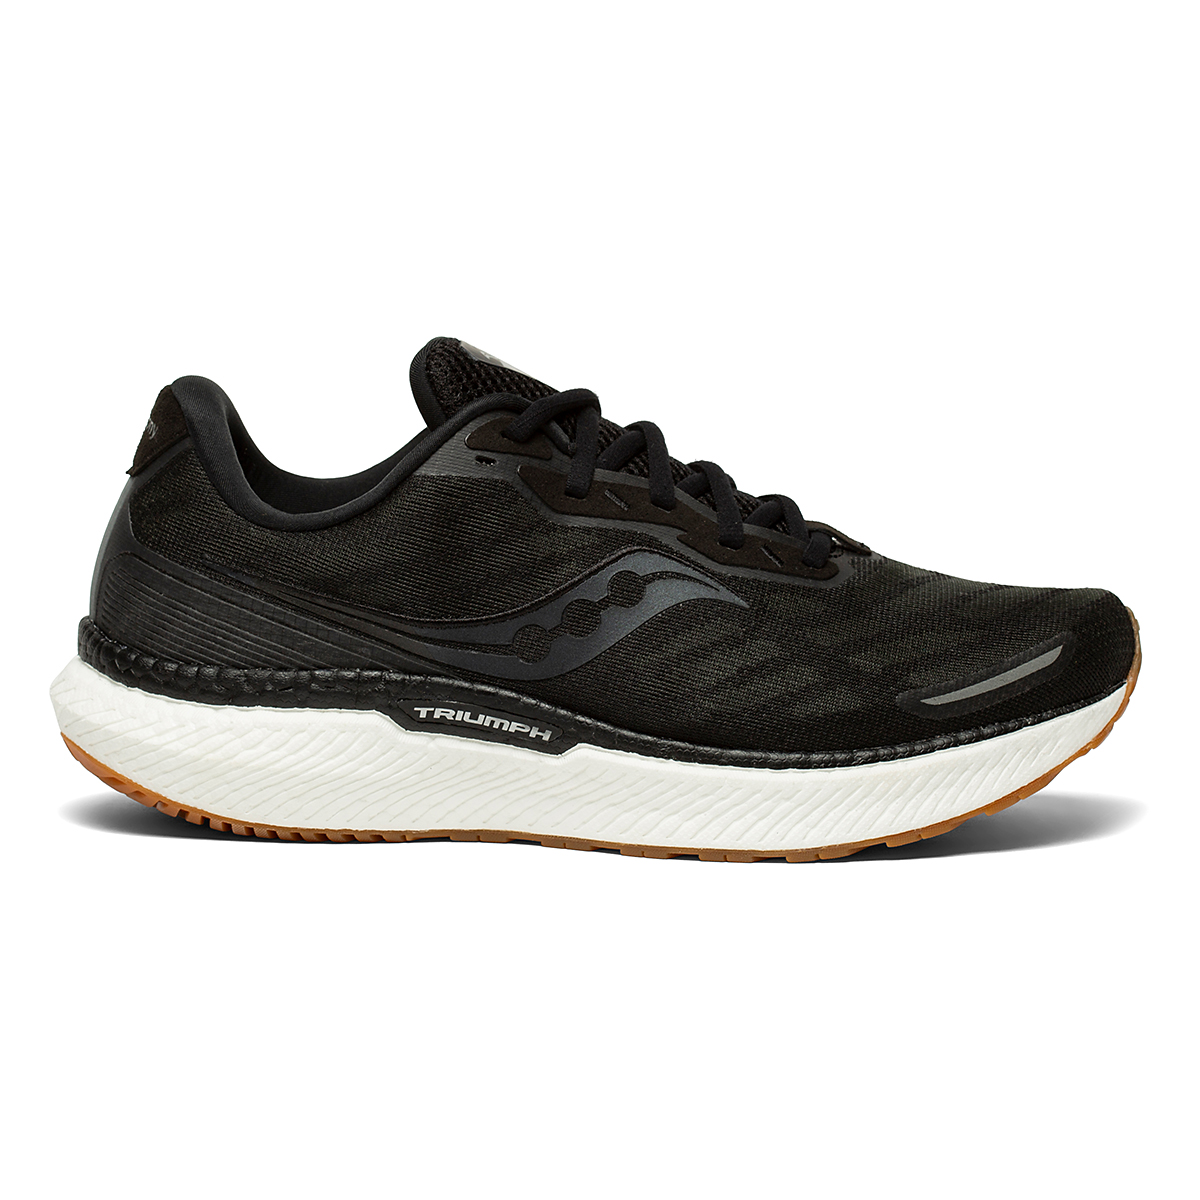 Men's Saucony Triumph 19 Running Shoe - Color: Black/Gum - Size: 7 - Width: Regular, Black/Gum, large, image 1